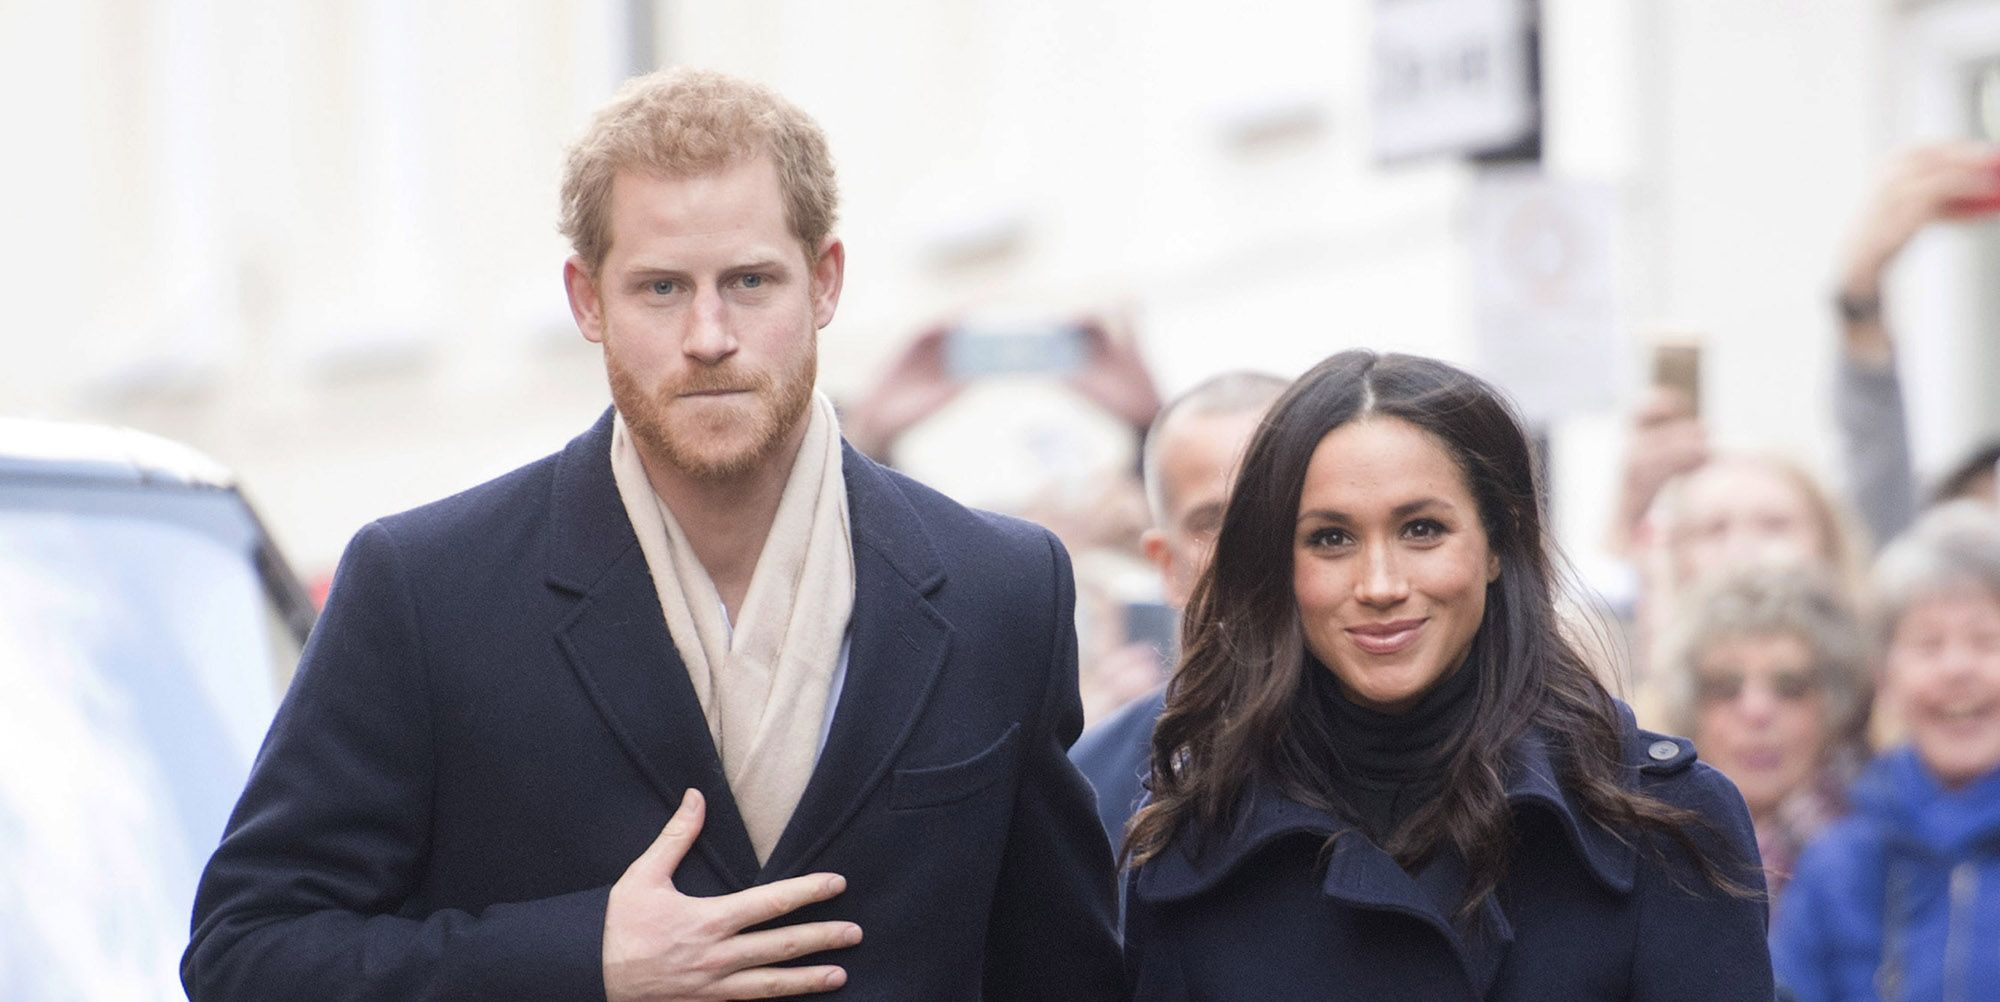 Prince Harry And Meghan Markle Donate $112,000 To Coronavirus Relief